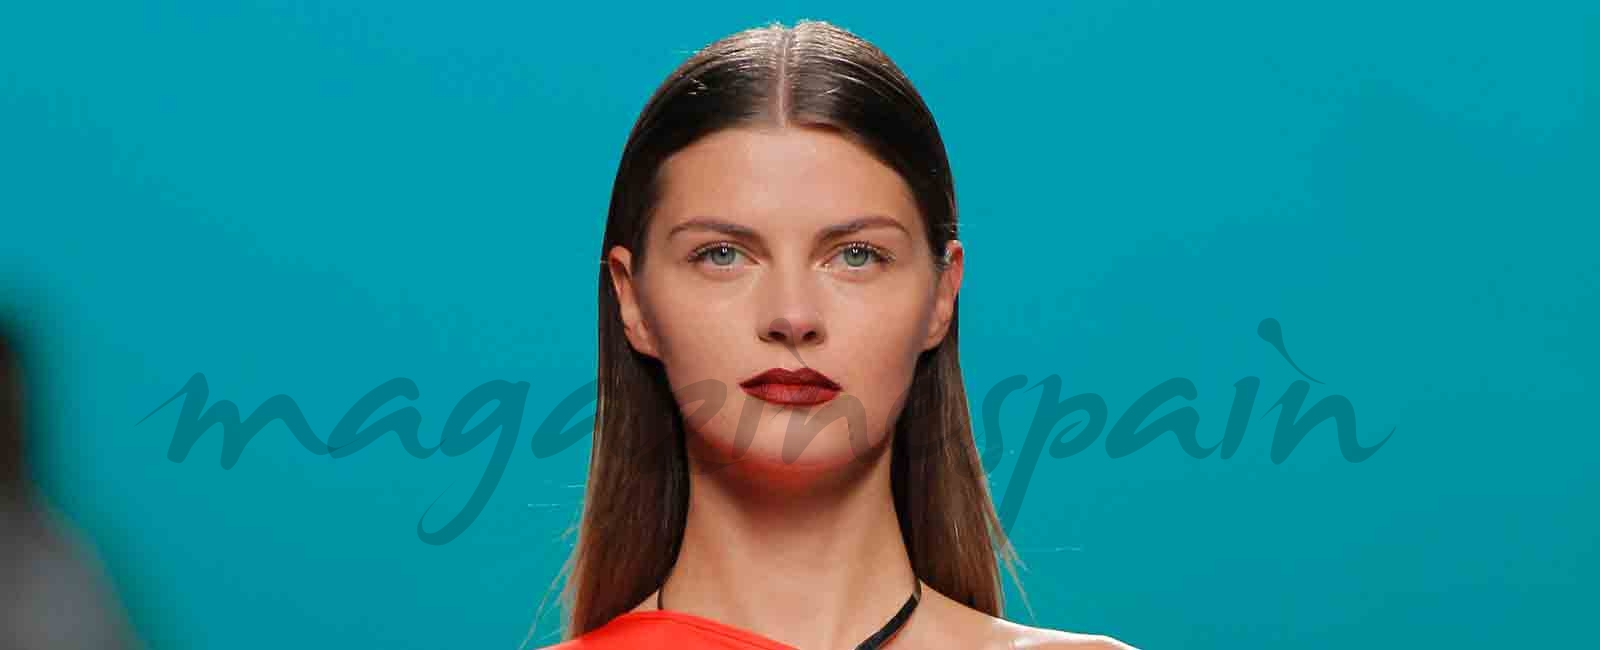 Mercedes Fashion Week: Ulises Mérida Primavera Verano 2018